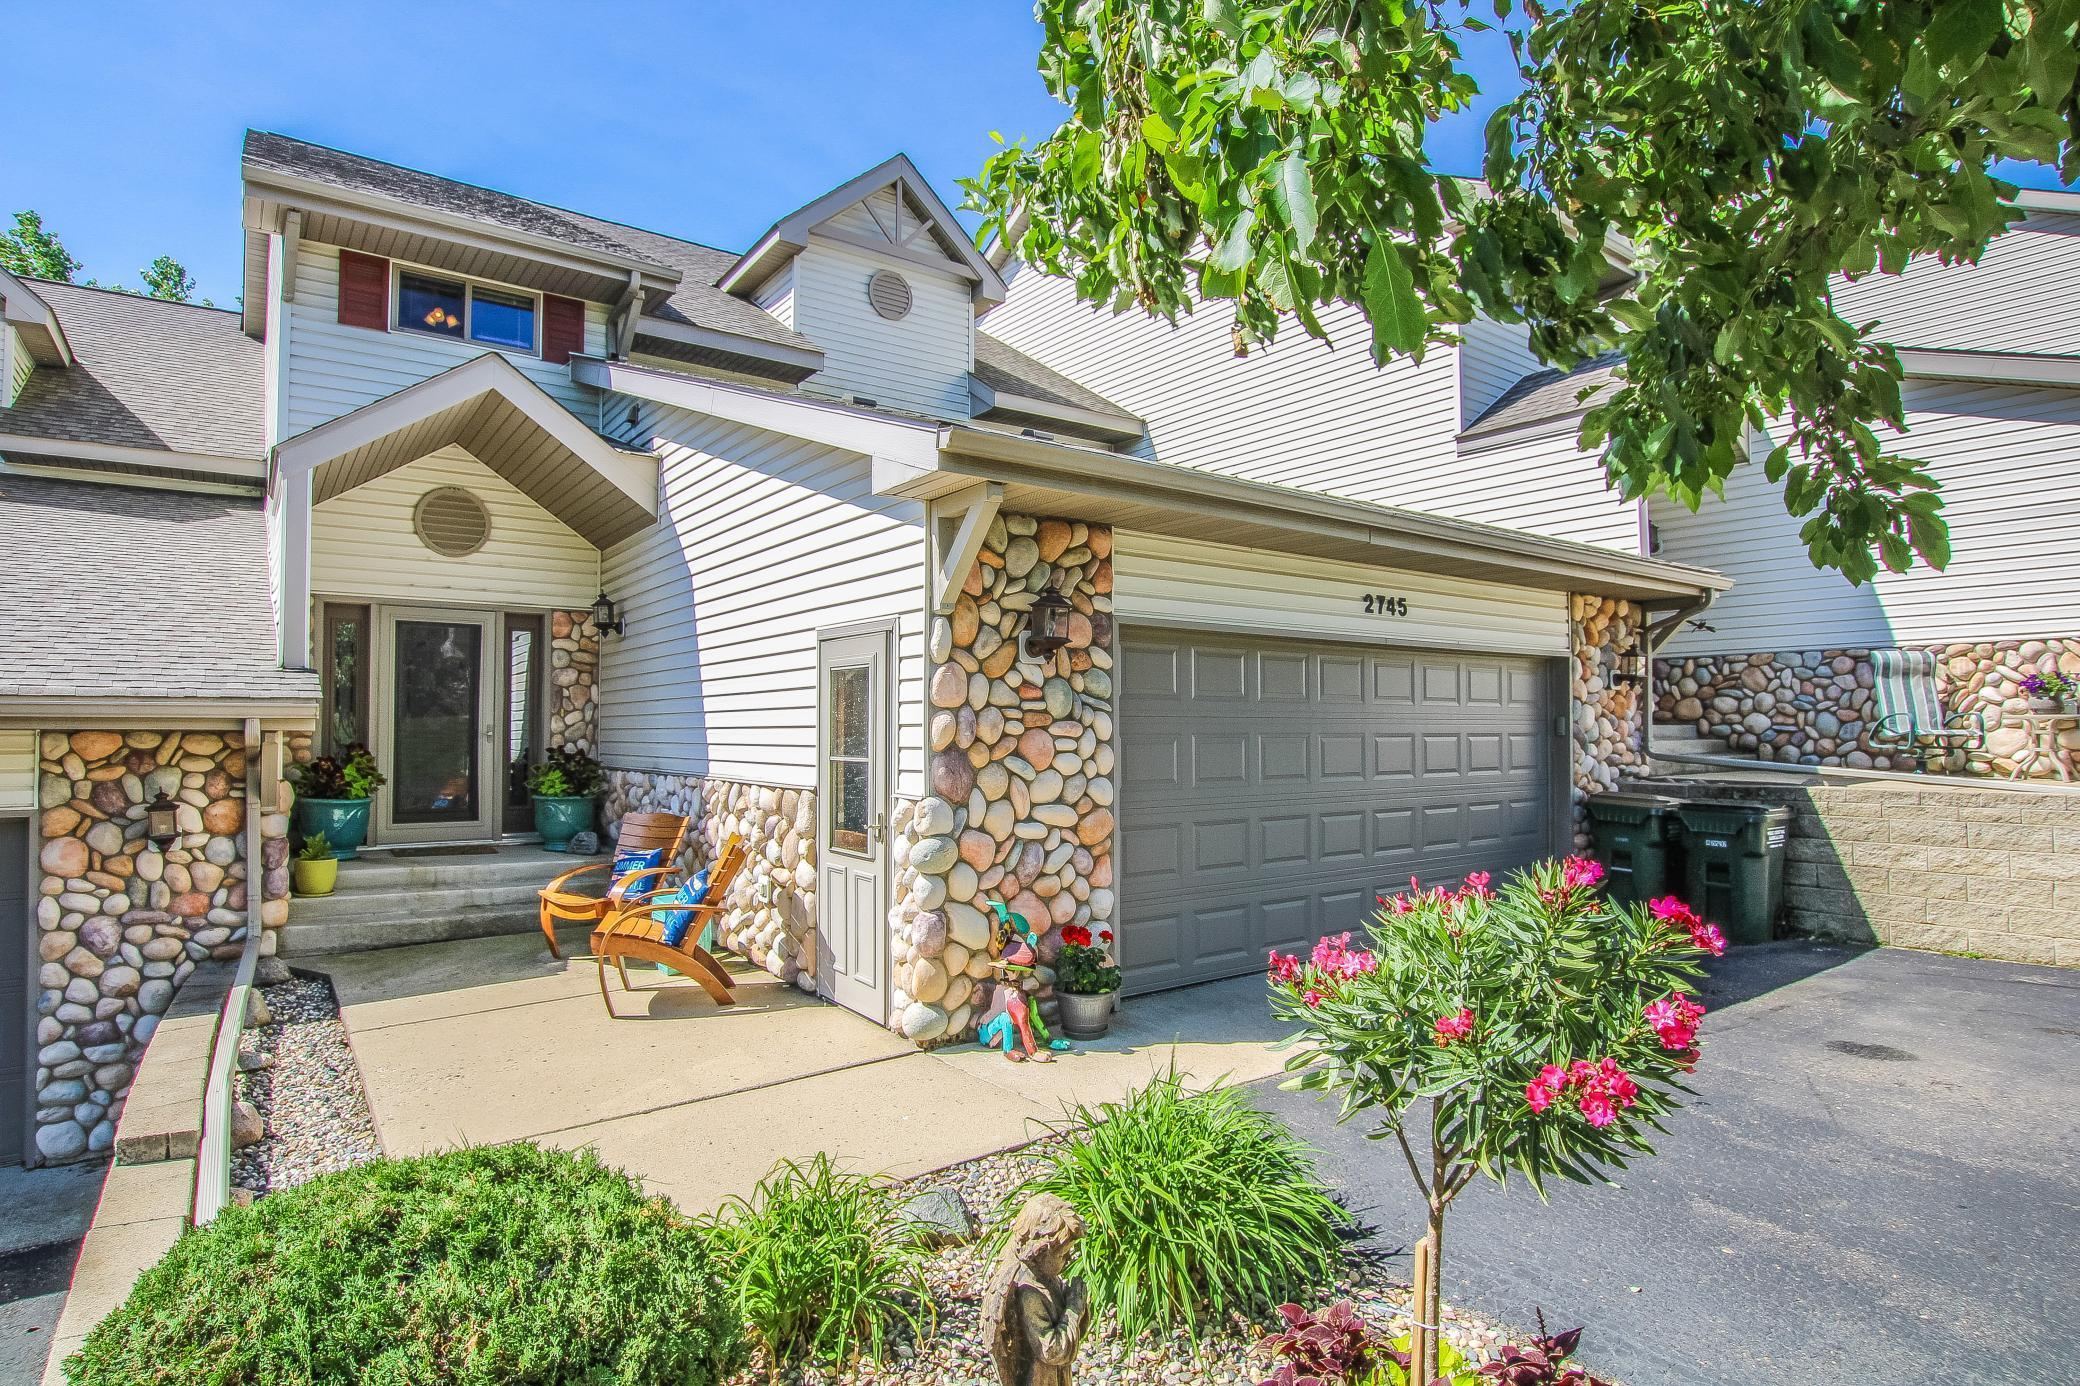 2745 Arrowwood NW Property Photo - Alexandria, MN real estate listing